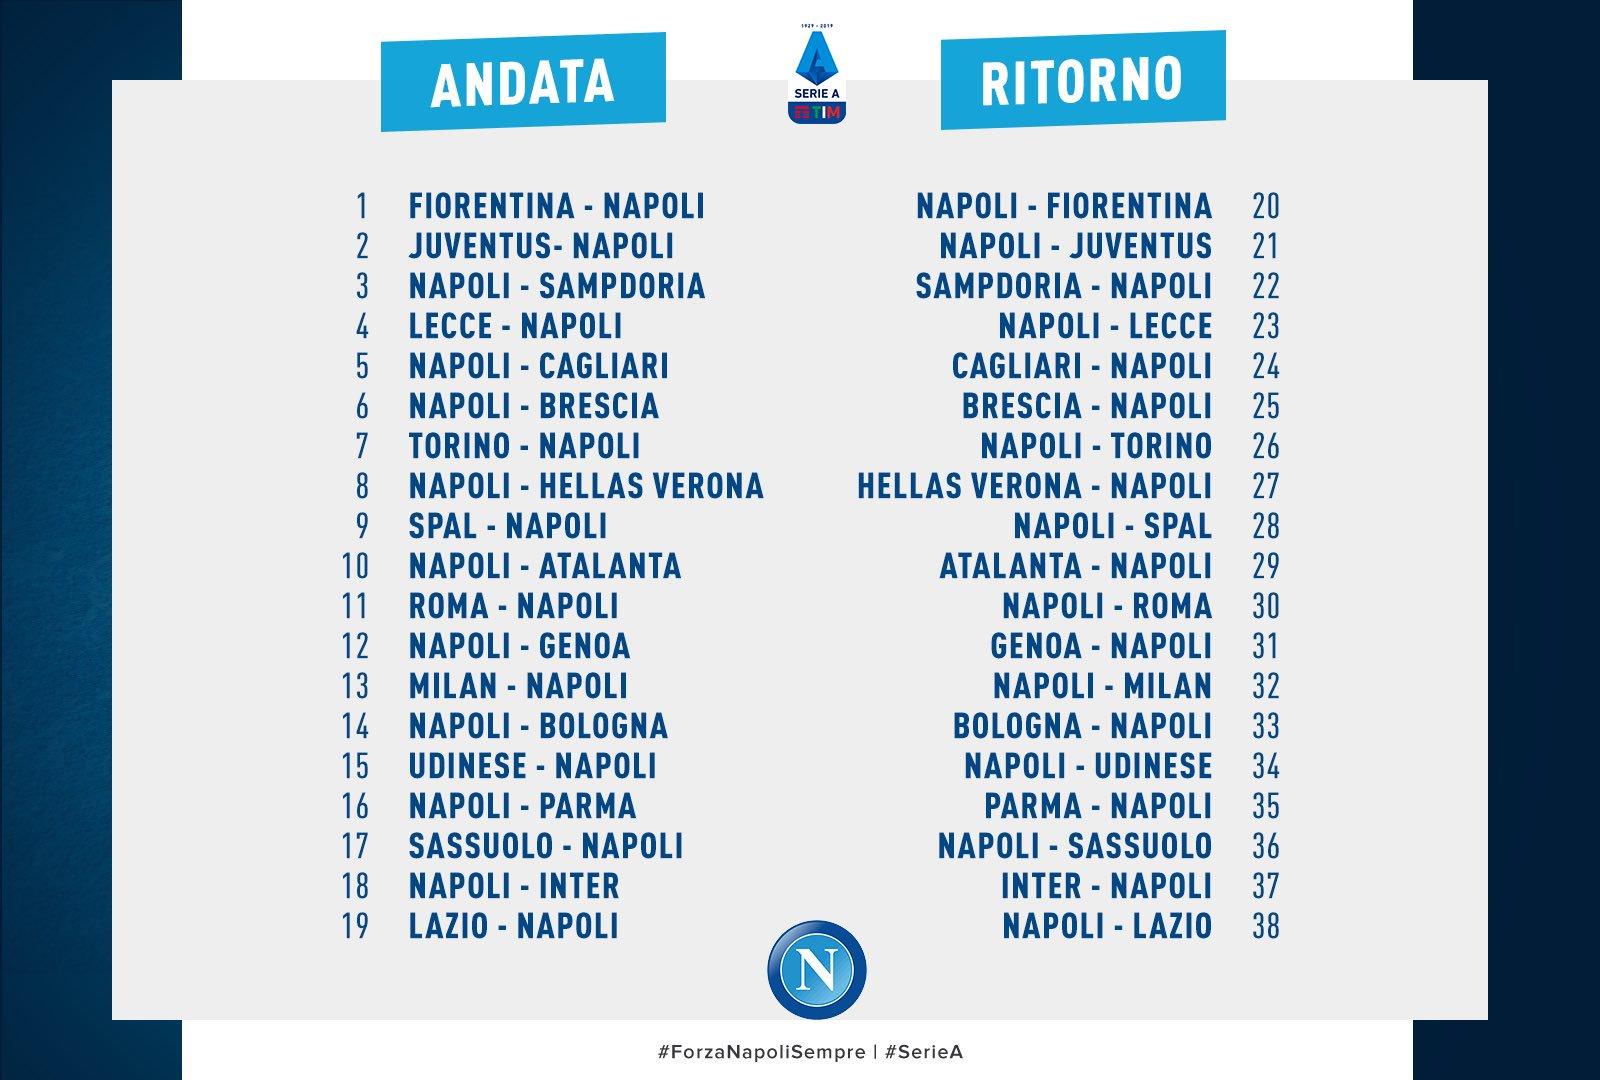 2018/19 Calcio Saga - Page 32 EAqam76X4AIGNKn?format=jpg&name=large